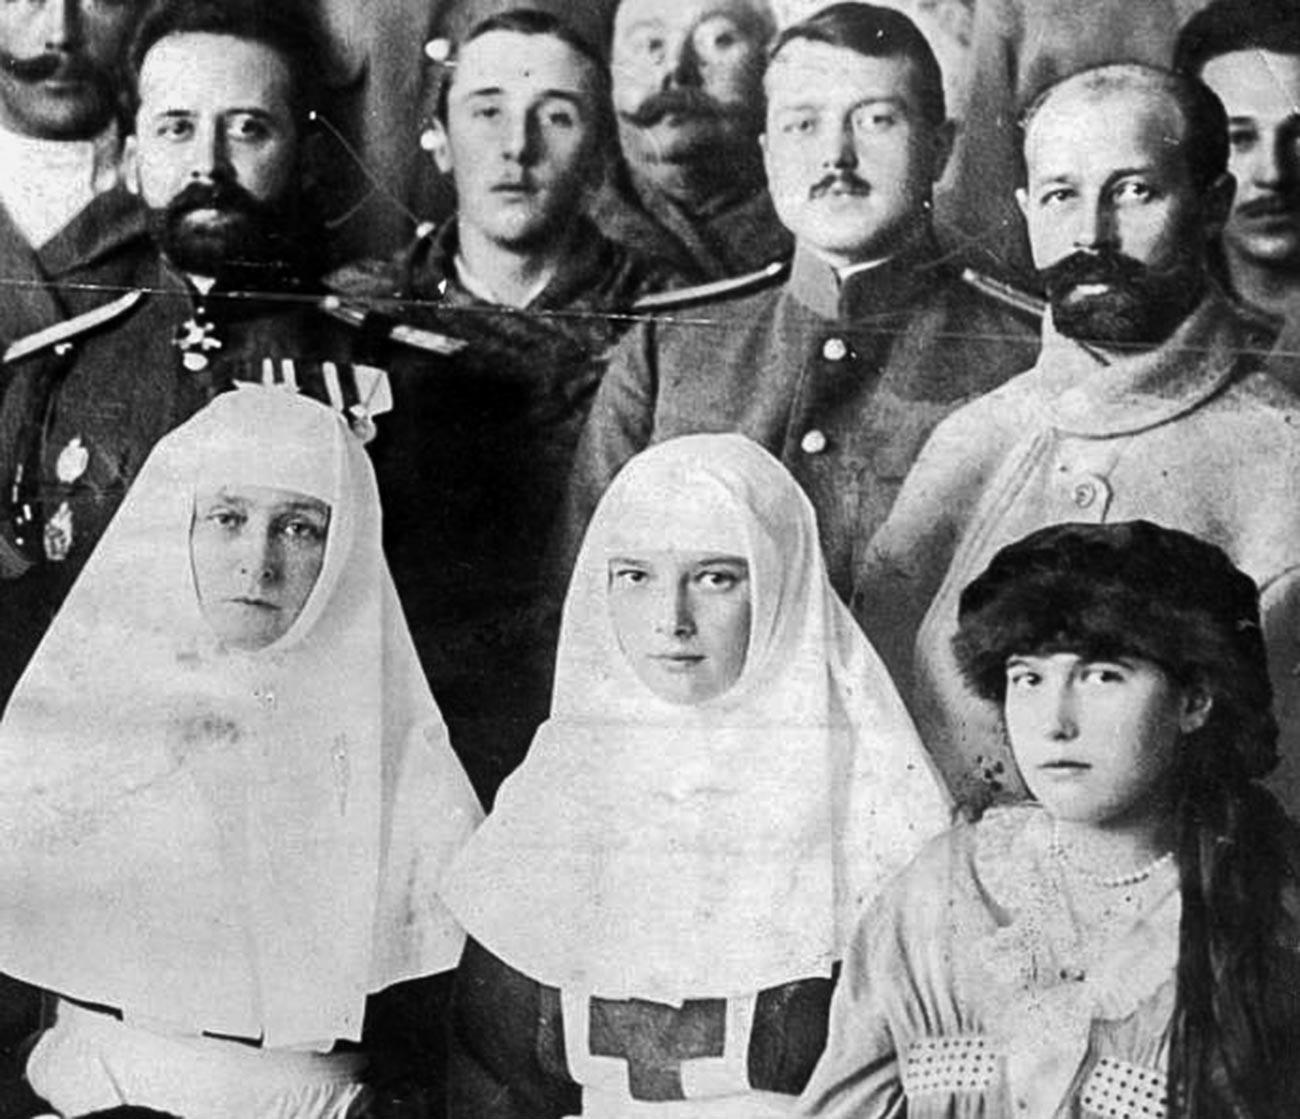 Zarin Alexandra Fjodorowna mit Tochtern Tatjana Nikolajewna und Anastasia Nikolajewna